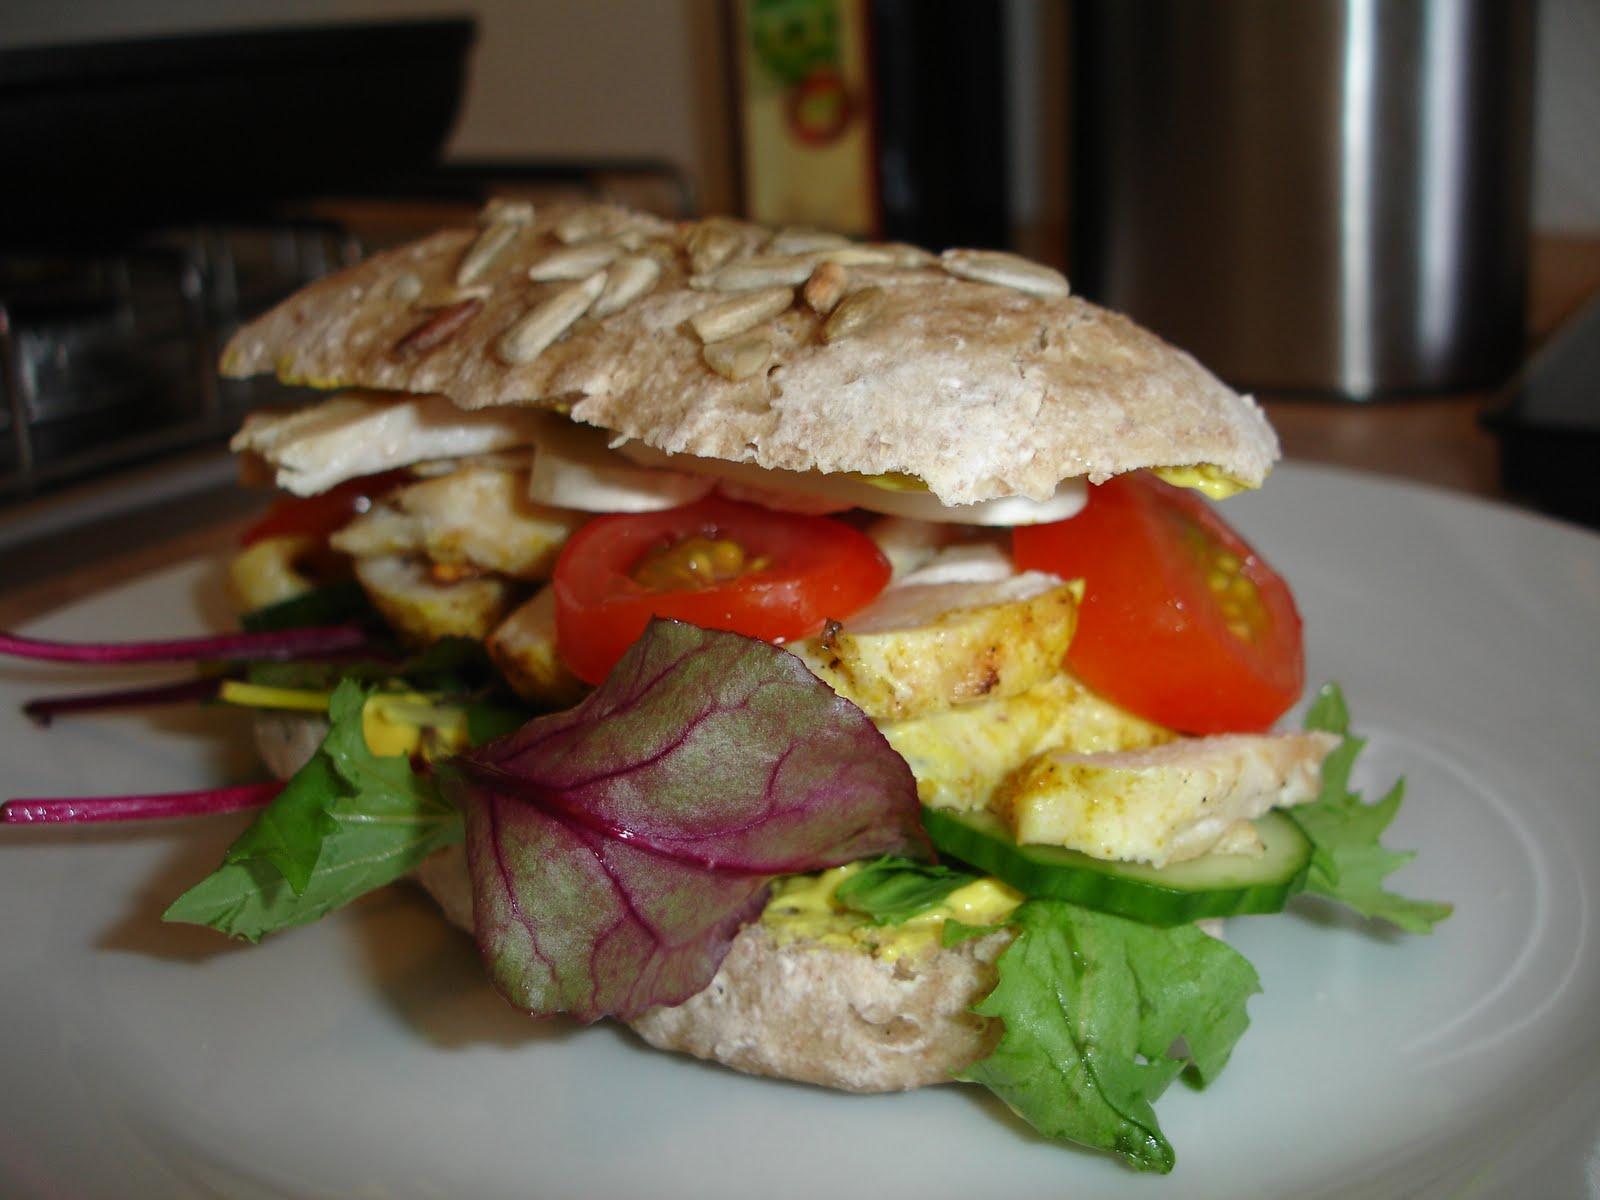 Sandwich med surdejsboller